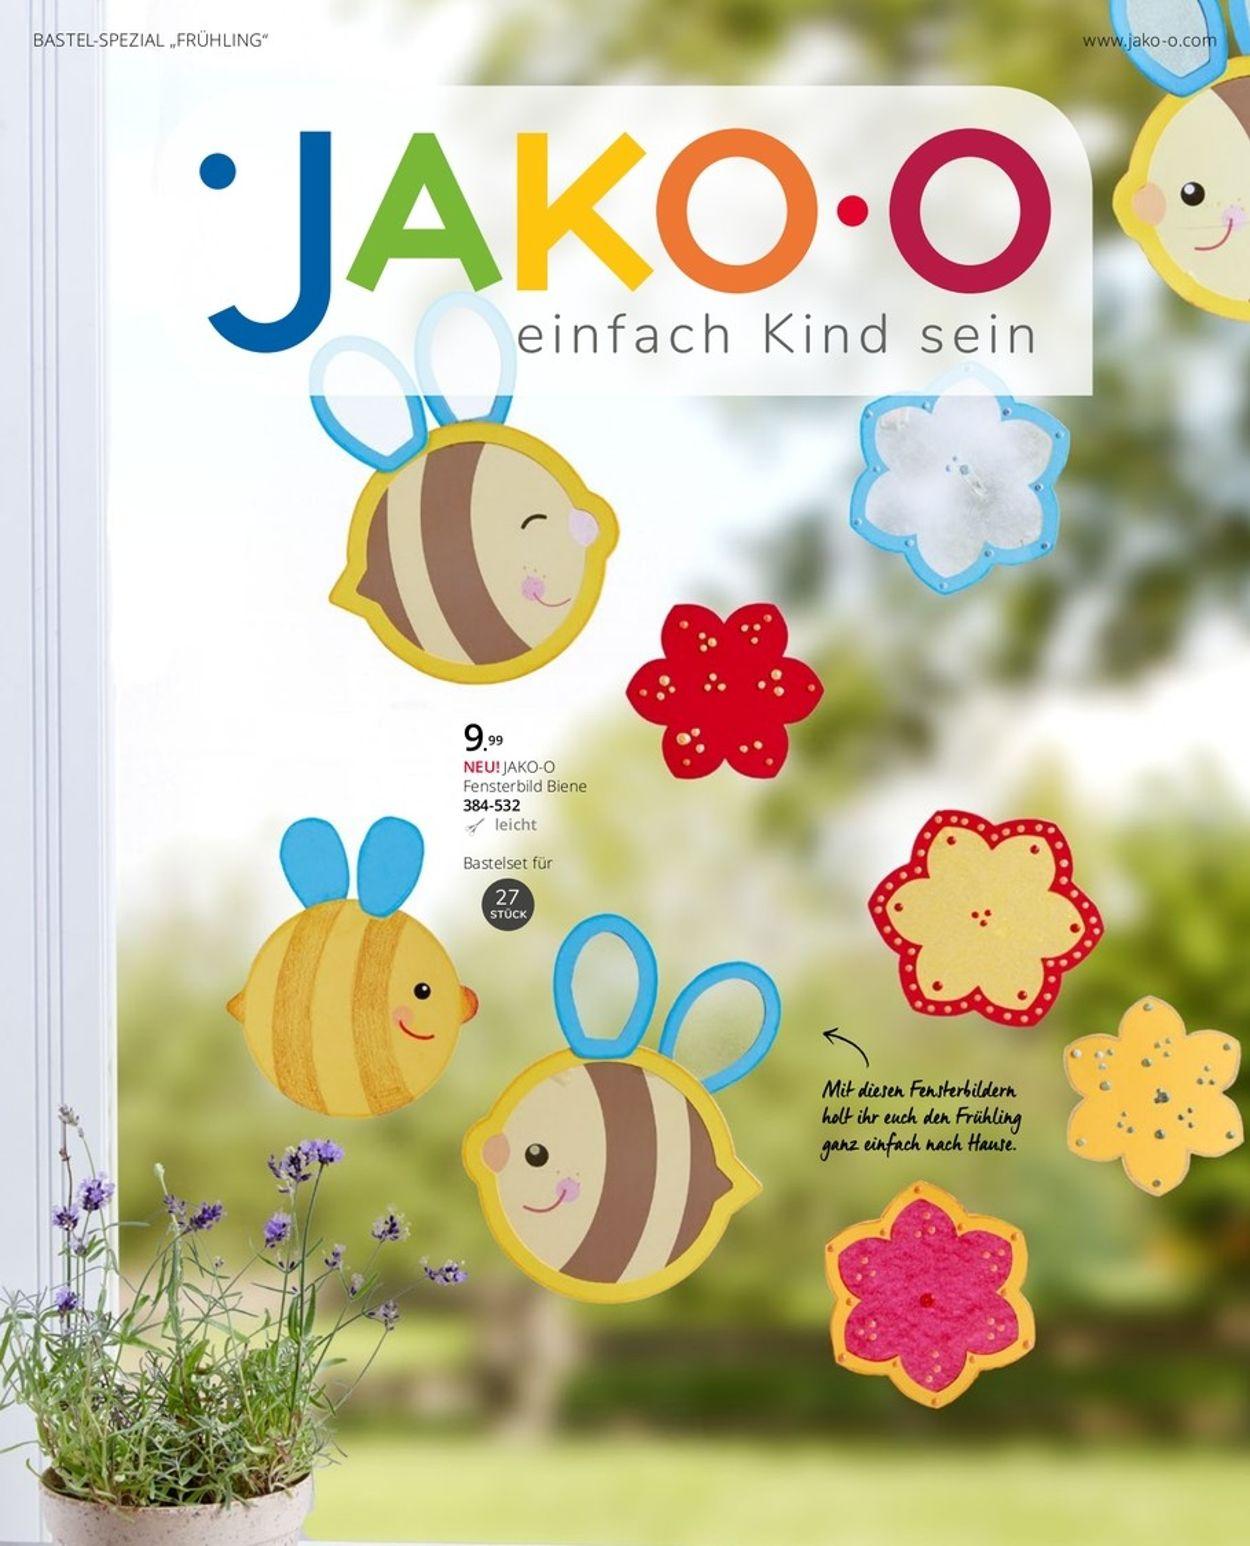 Prospekt JAKO-O Bastel-Spezial Frühling 2021 vom 01.03.2021